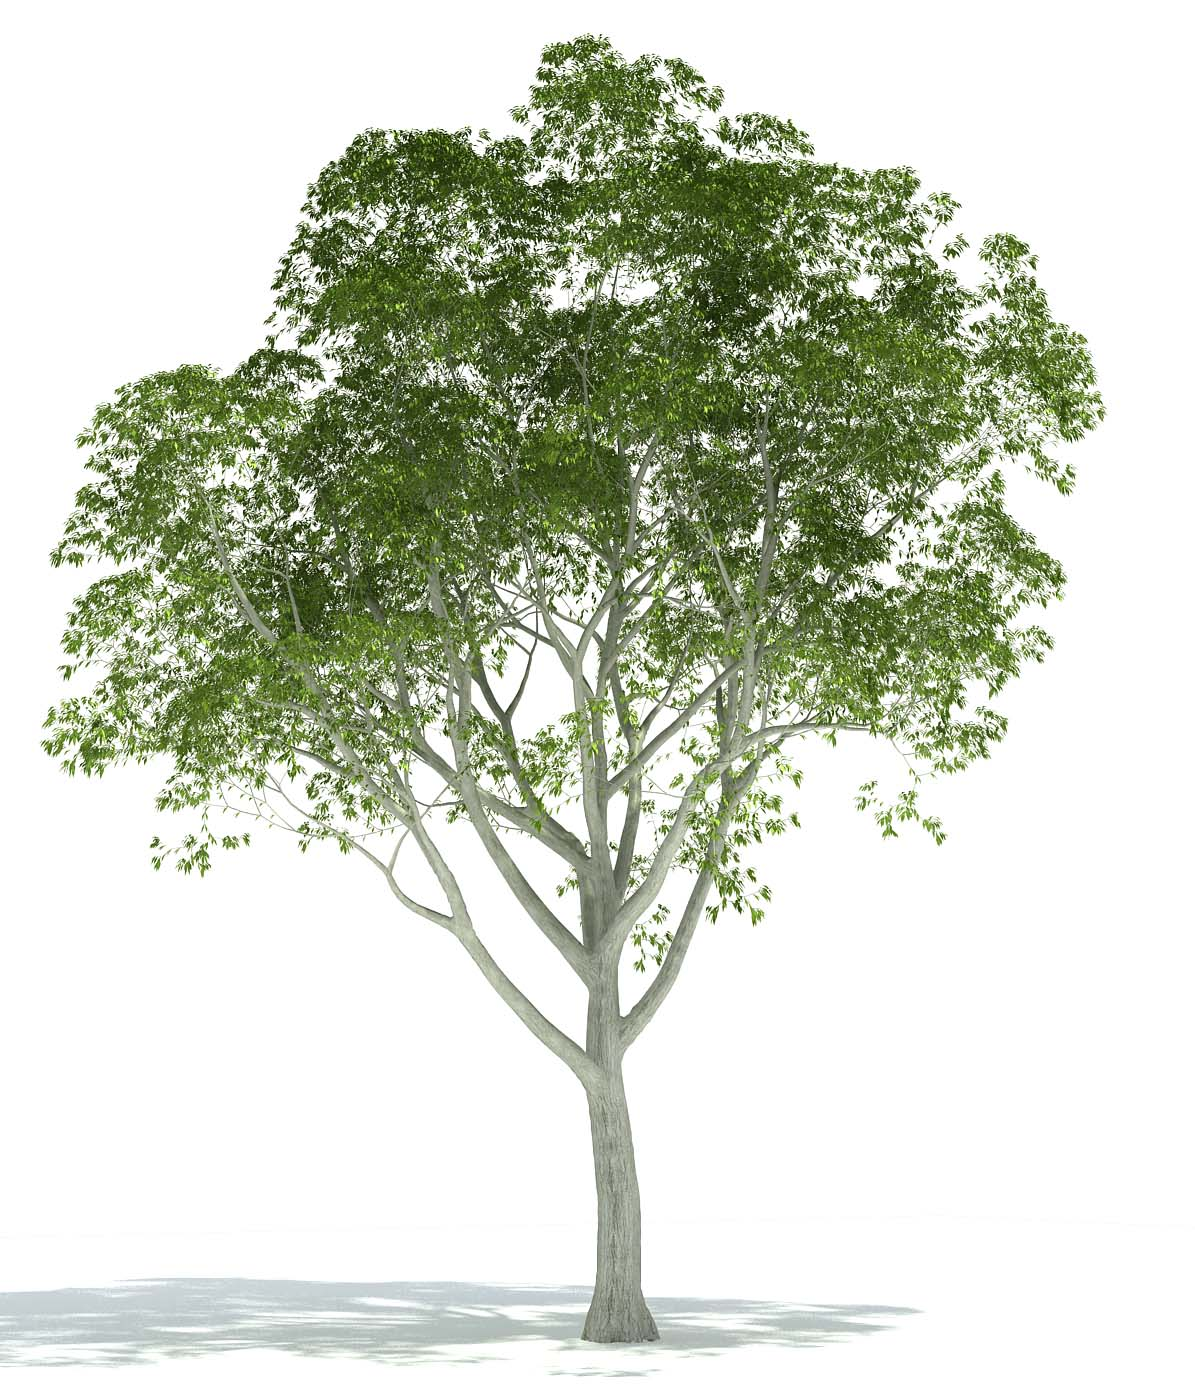 Exlevel com - Plants Library